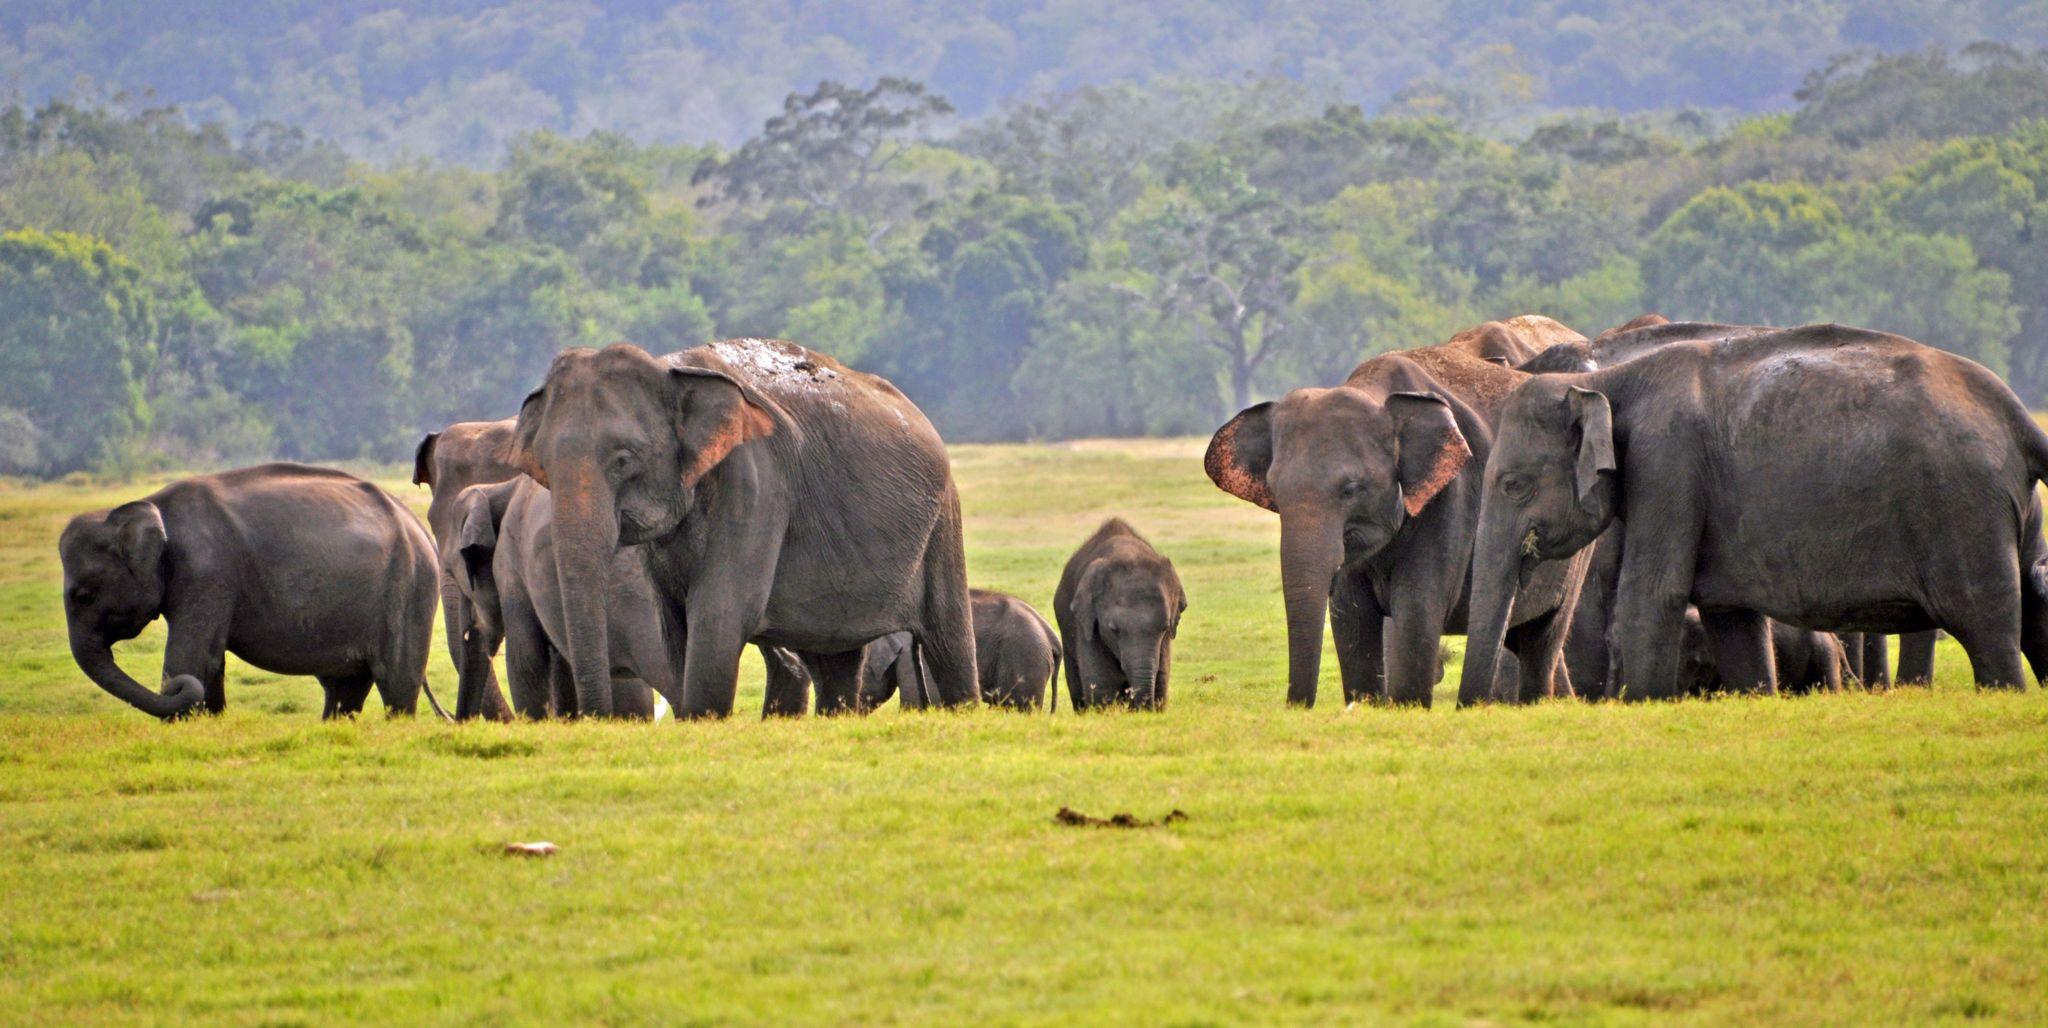 Kaudulla National Park in central Sri Lanka, August 2019.